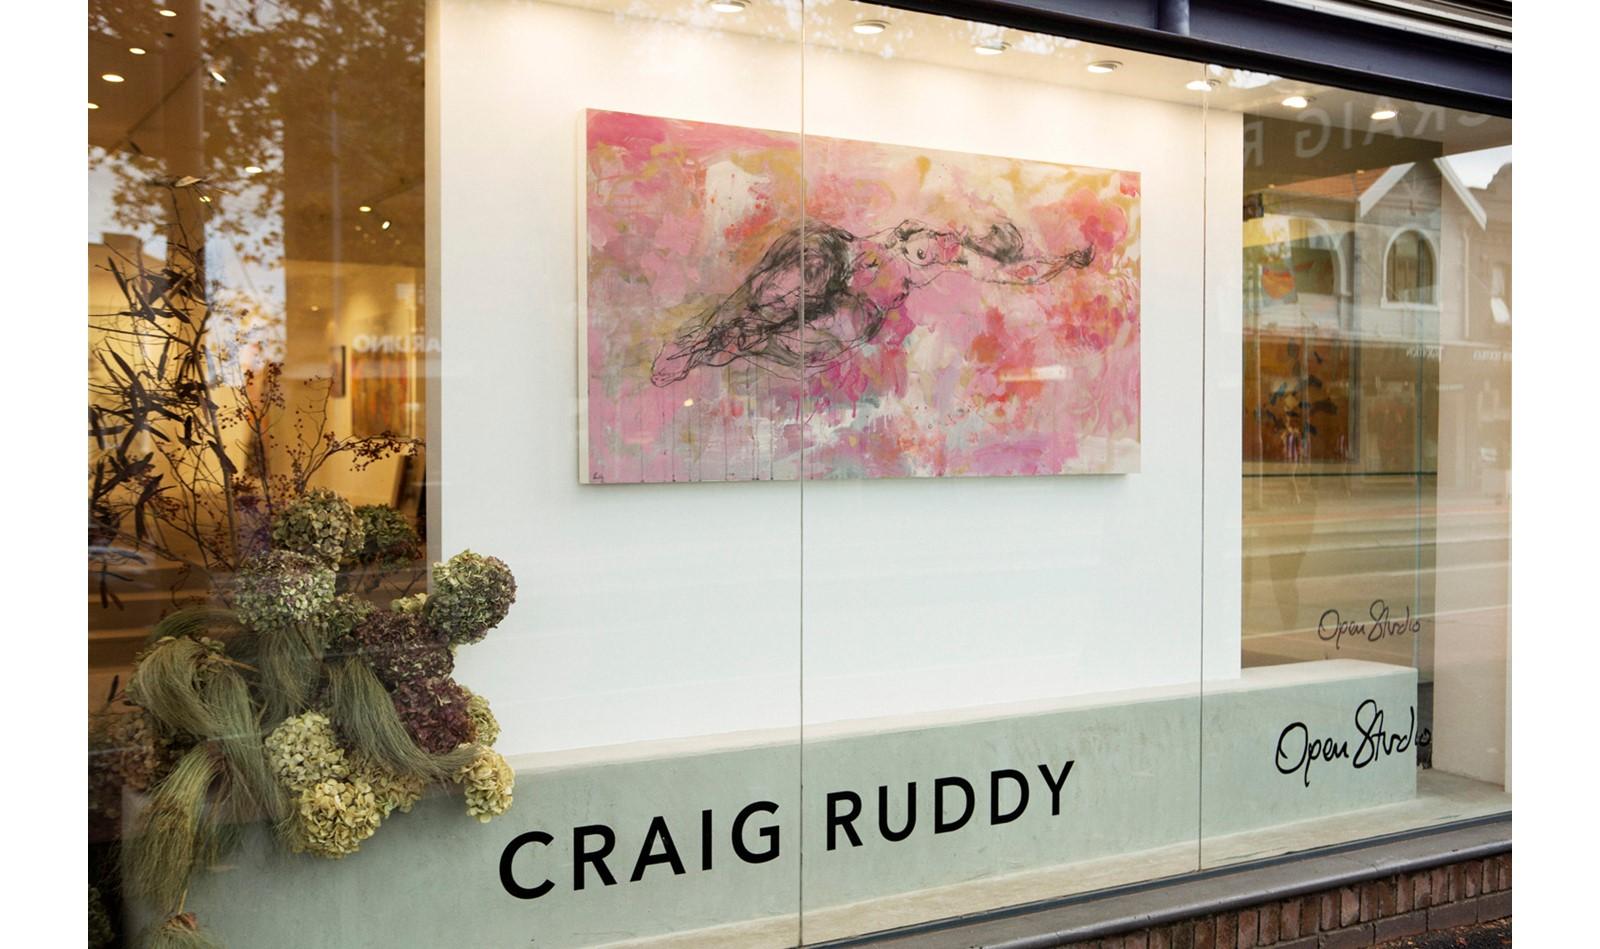 black magazinecraig ruddy - open studio - Craig Ruddy / Open Studio28 June - 10 July 2018Studio#2, 17 Oxford St, Paddingtonview article here